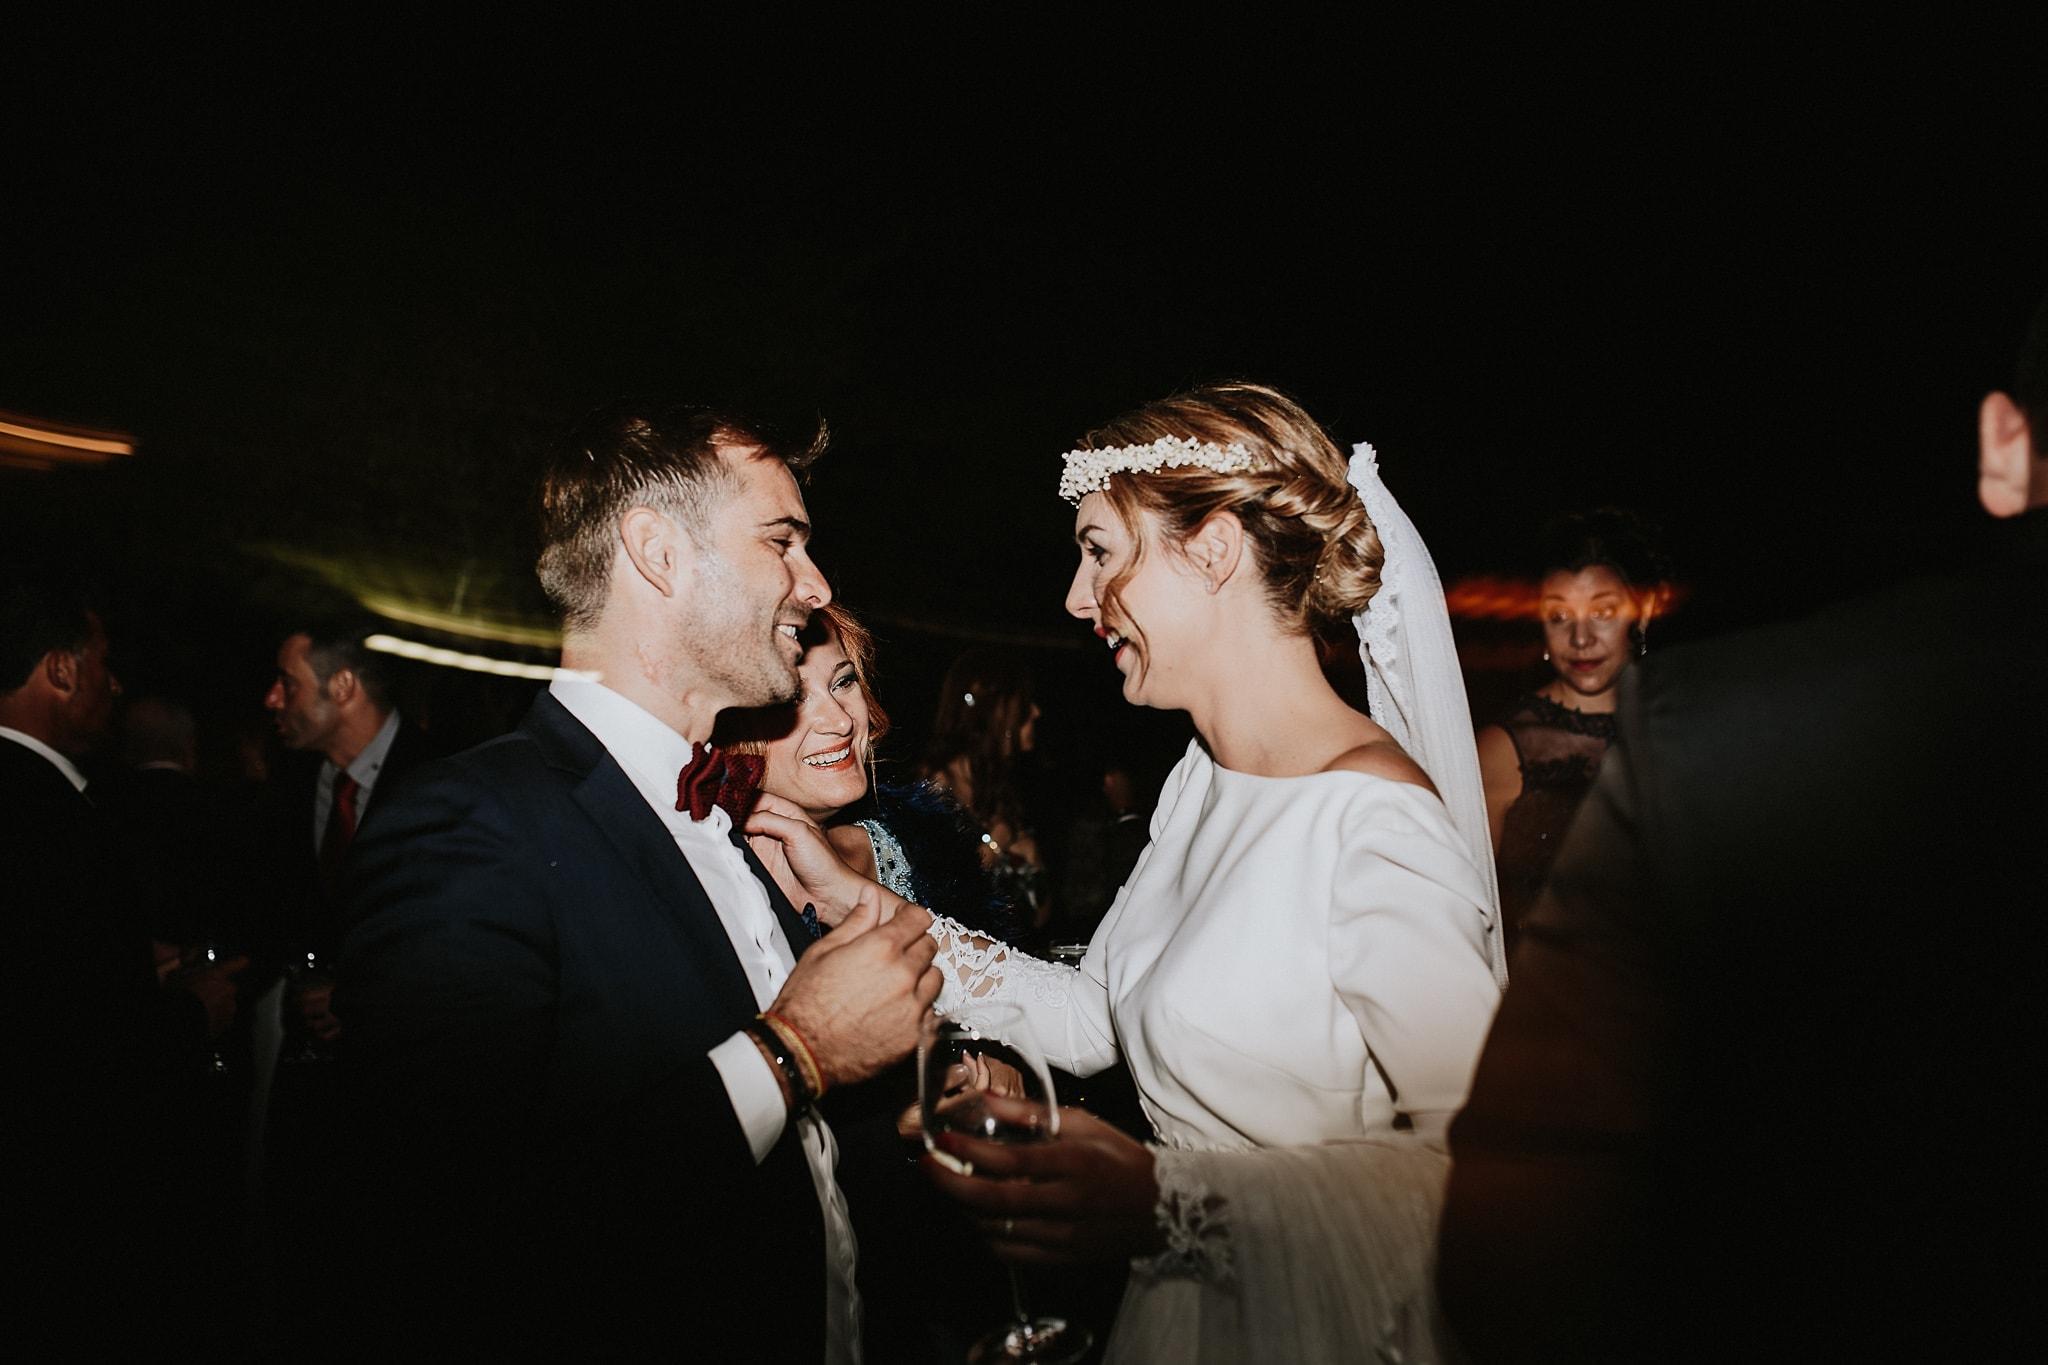 prisma-blanco-fotografos-bodas-toledo-143